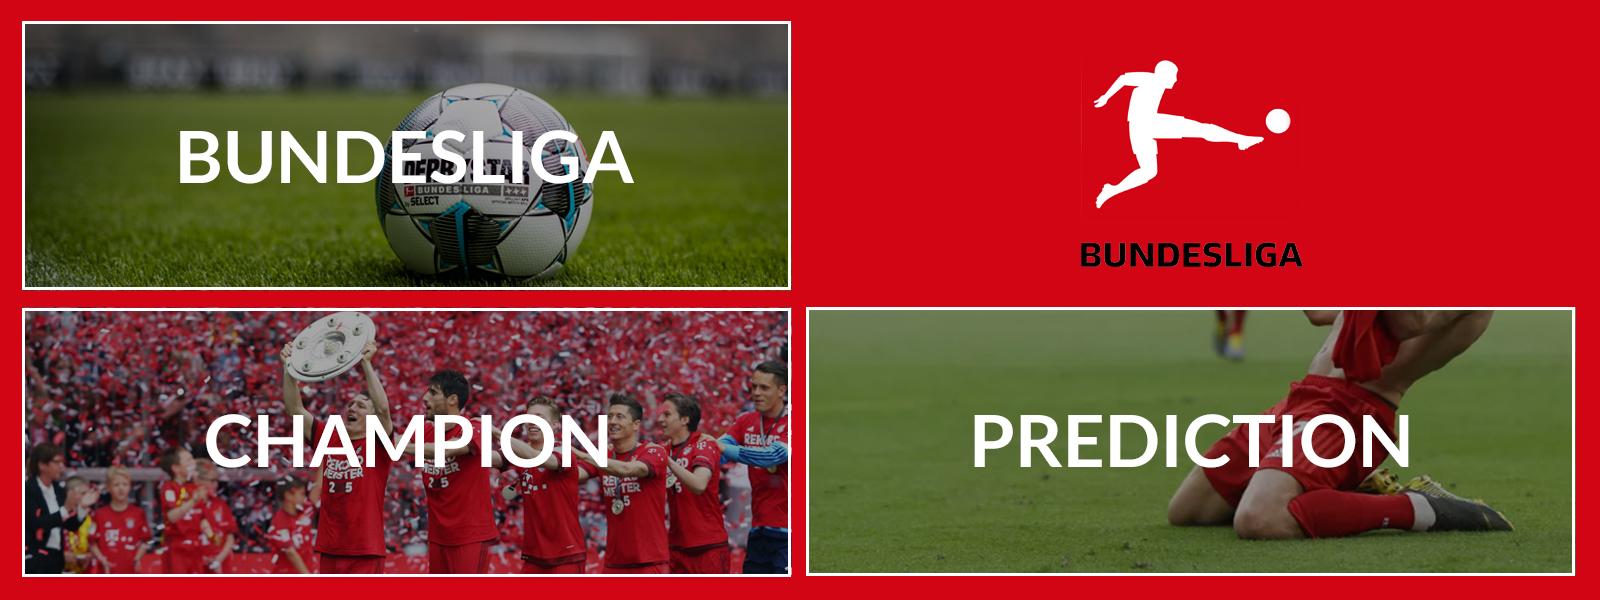 Germany Bundesliga Champion Prediction